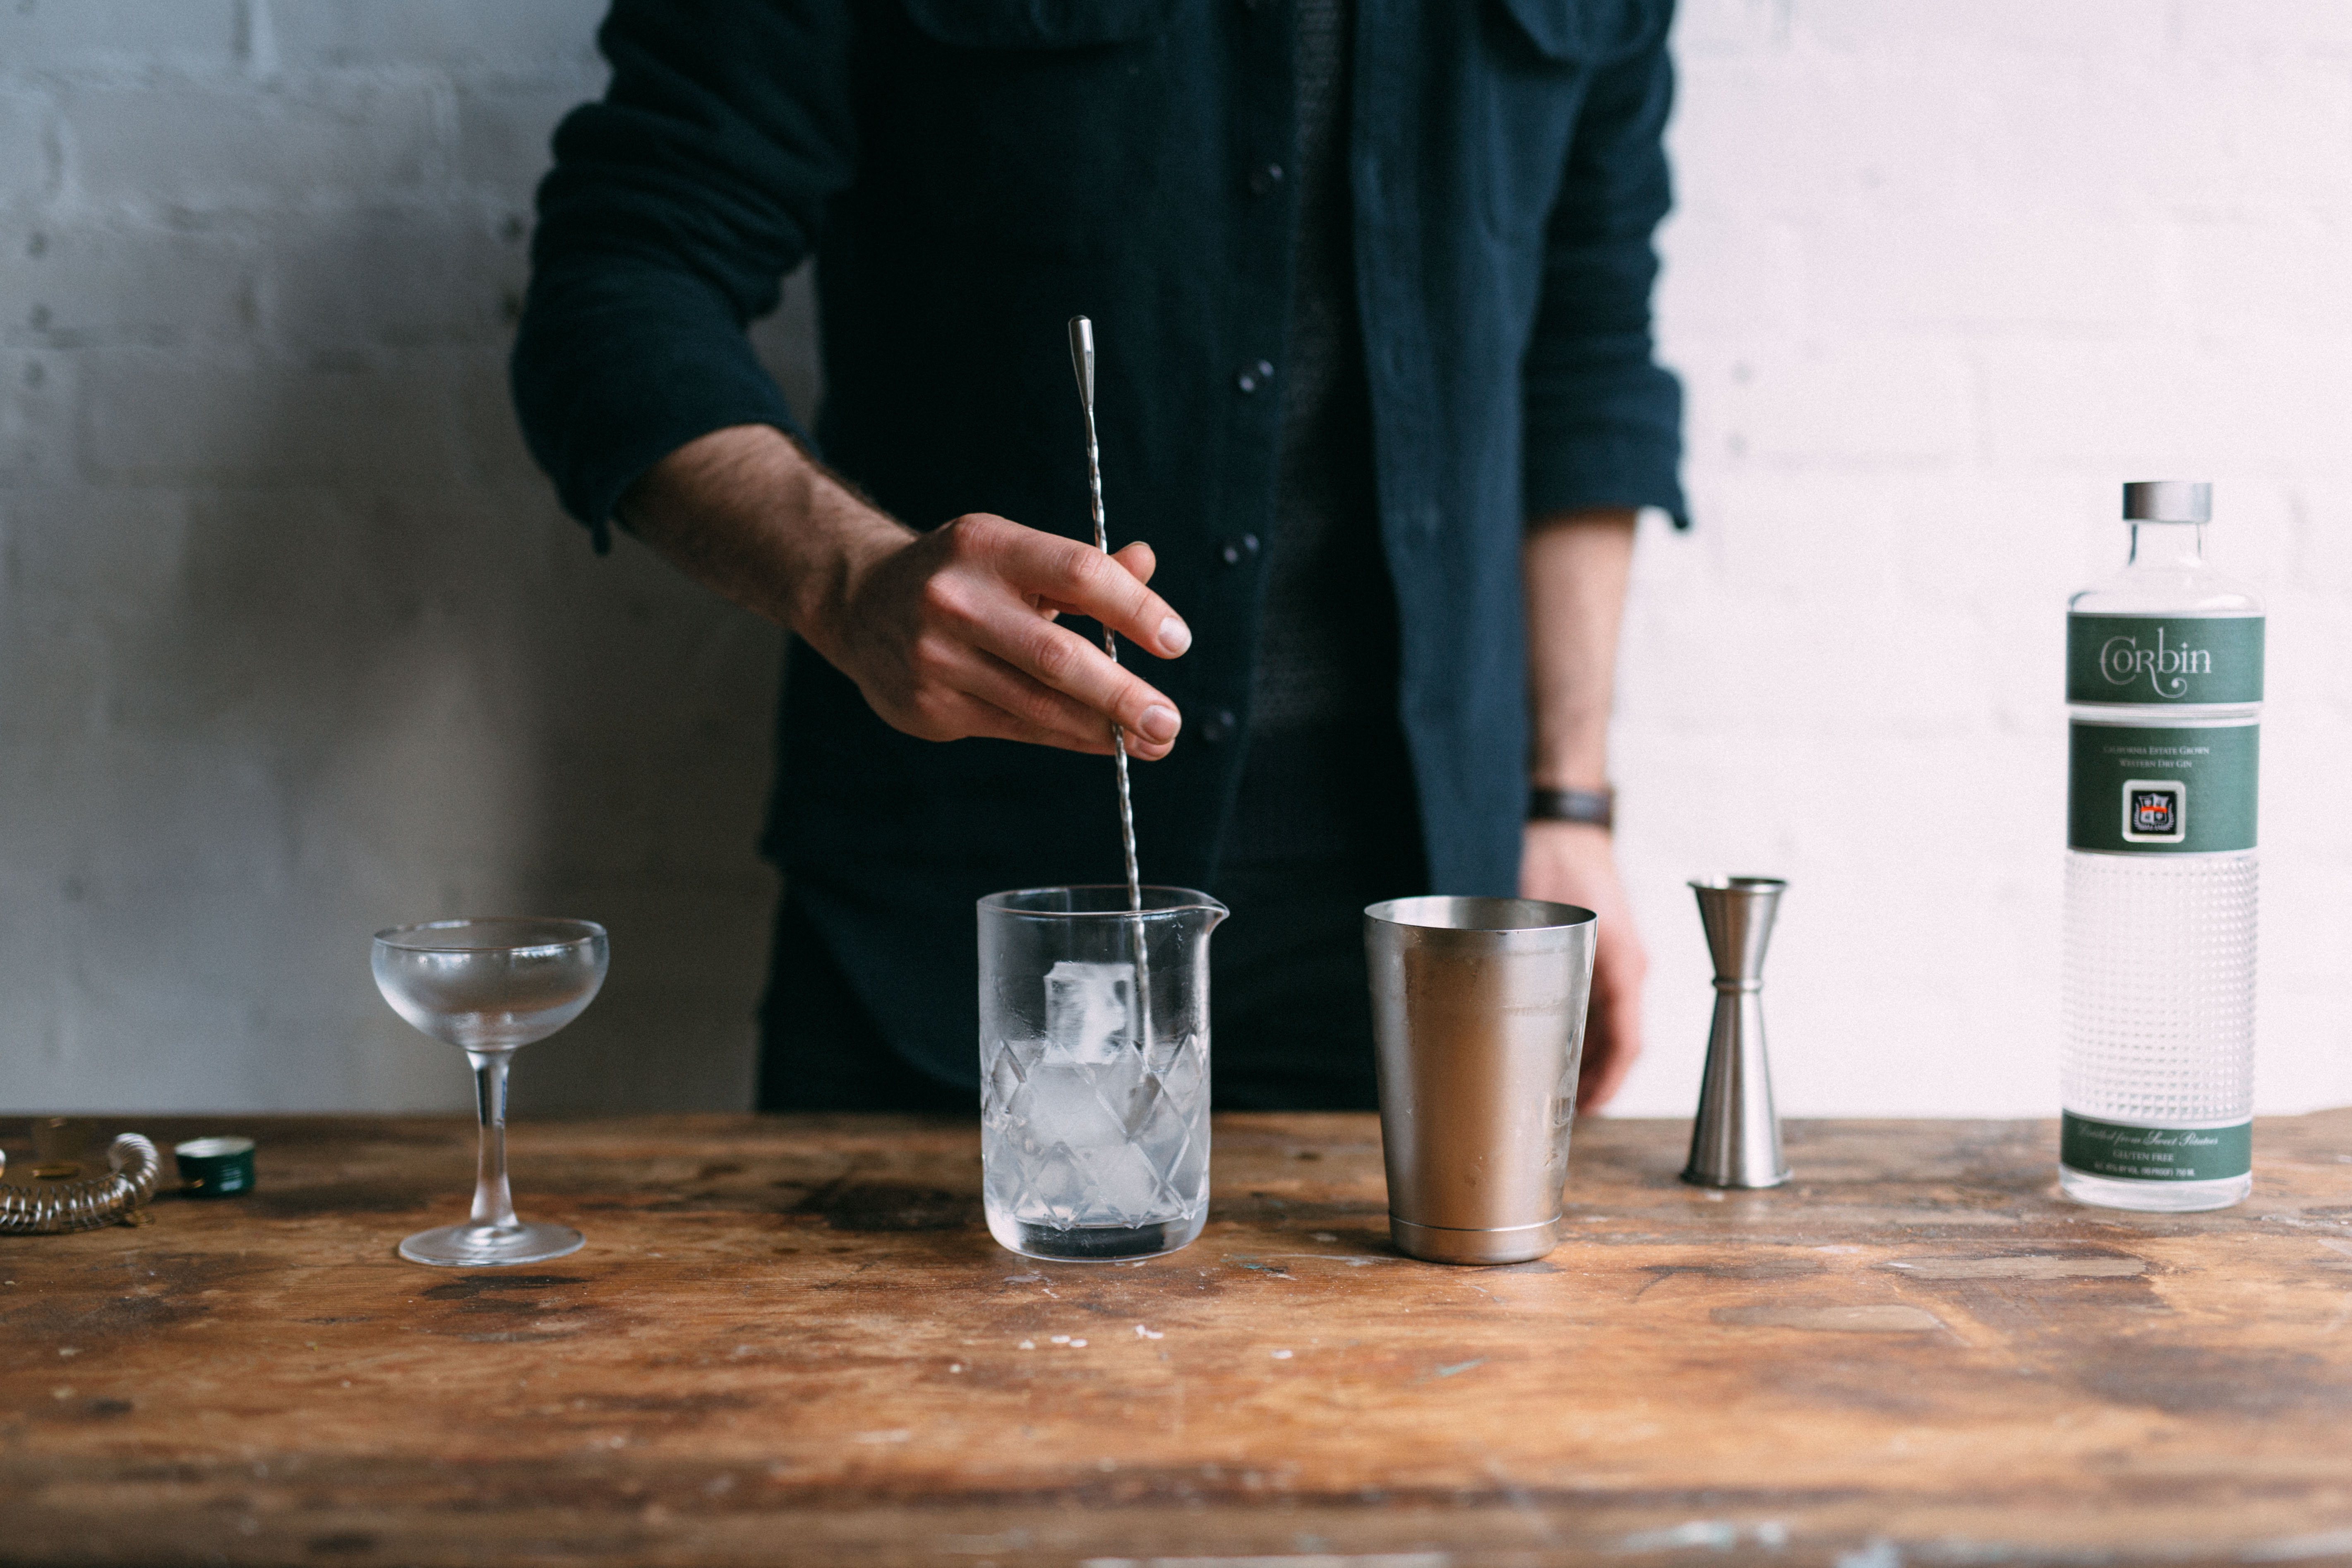 Stirring the martini